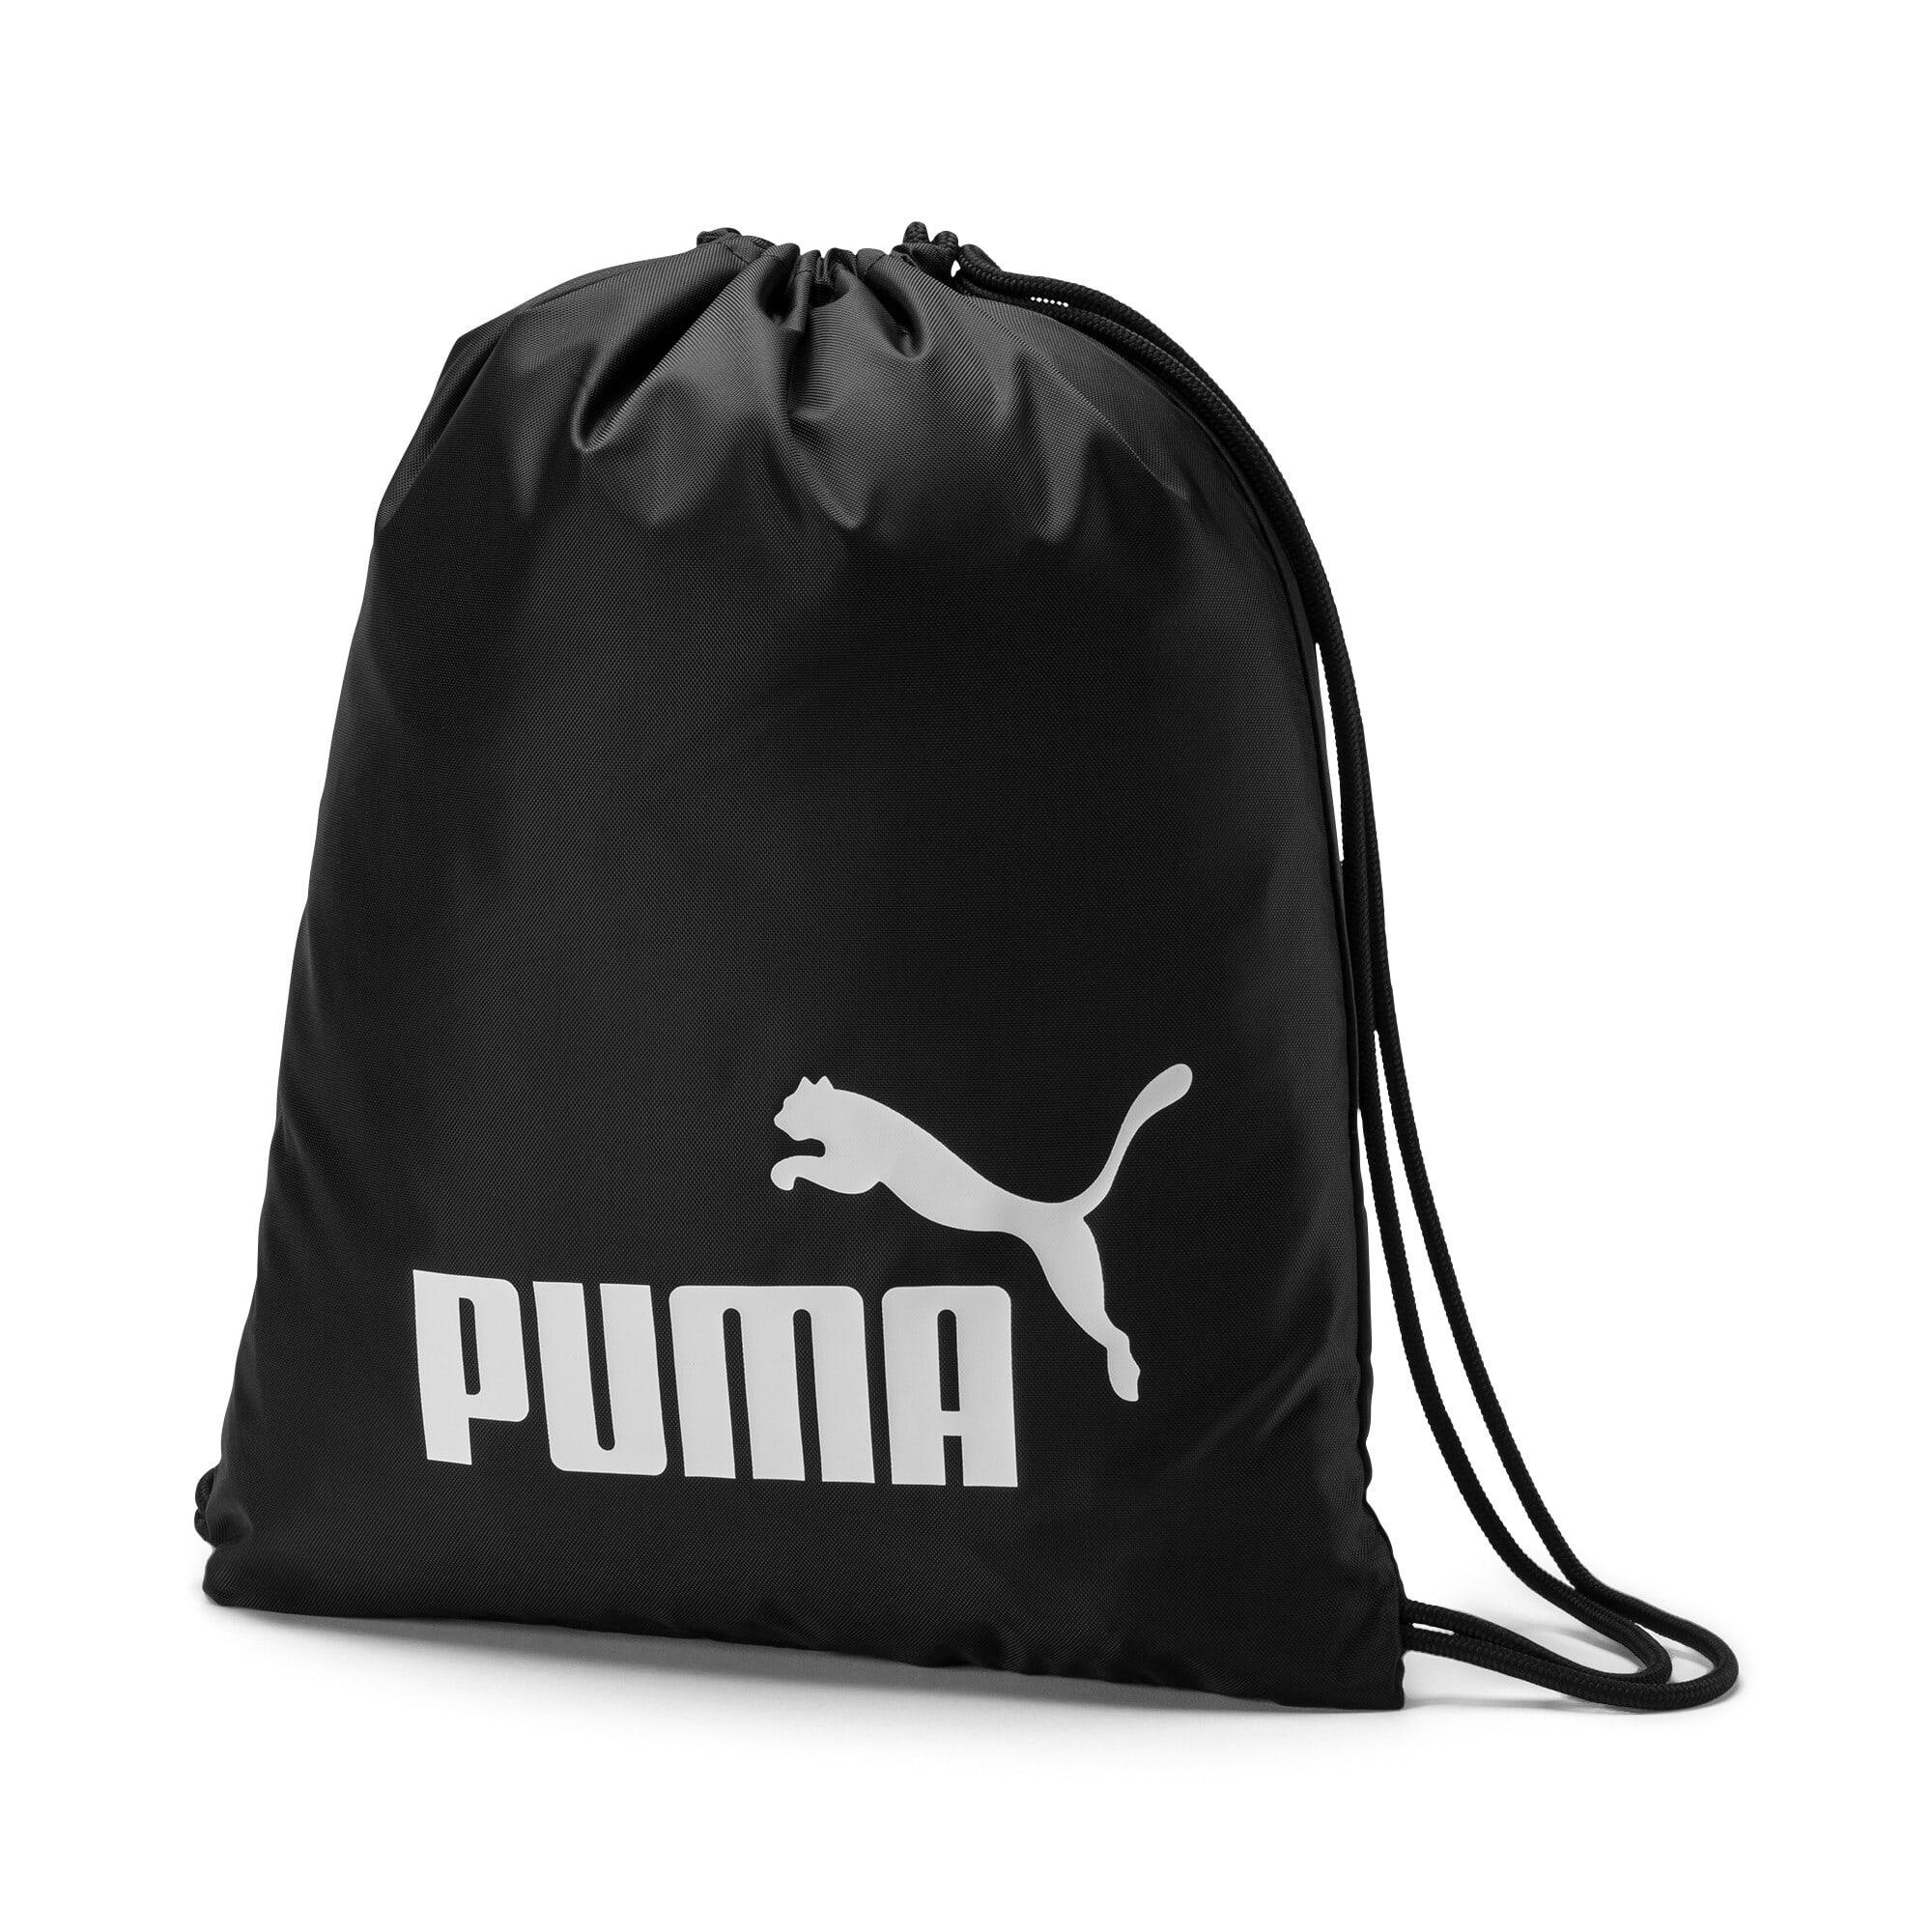 Thumbnail 1 of Classic Gym Sack, Puma Black, medium-IND